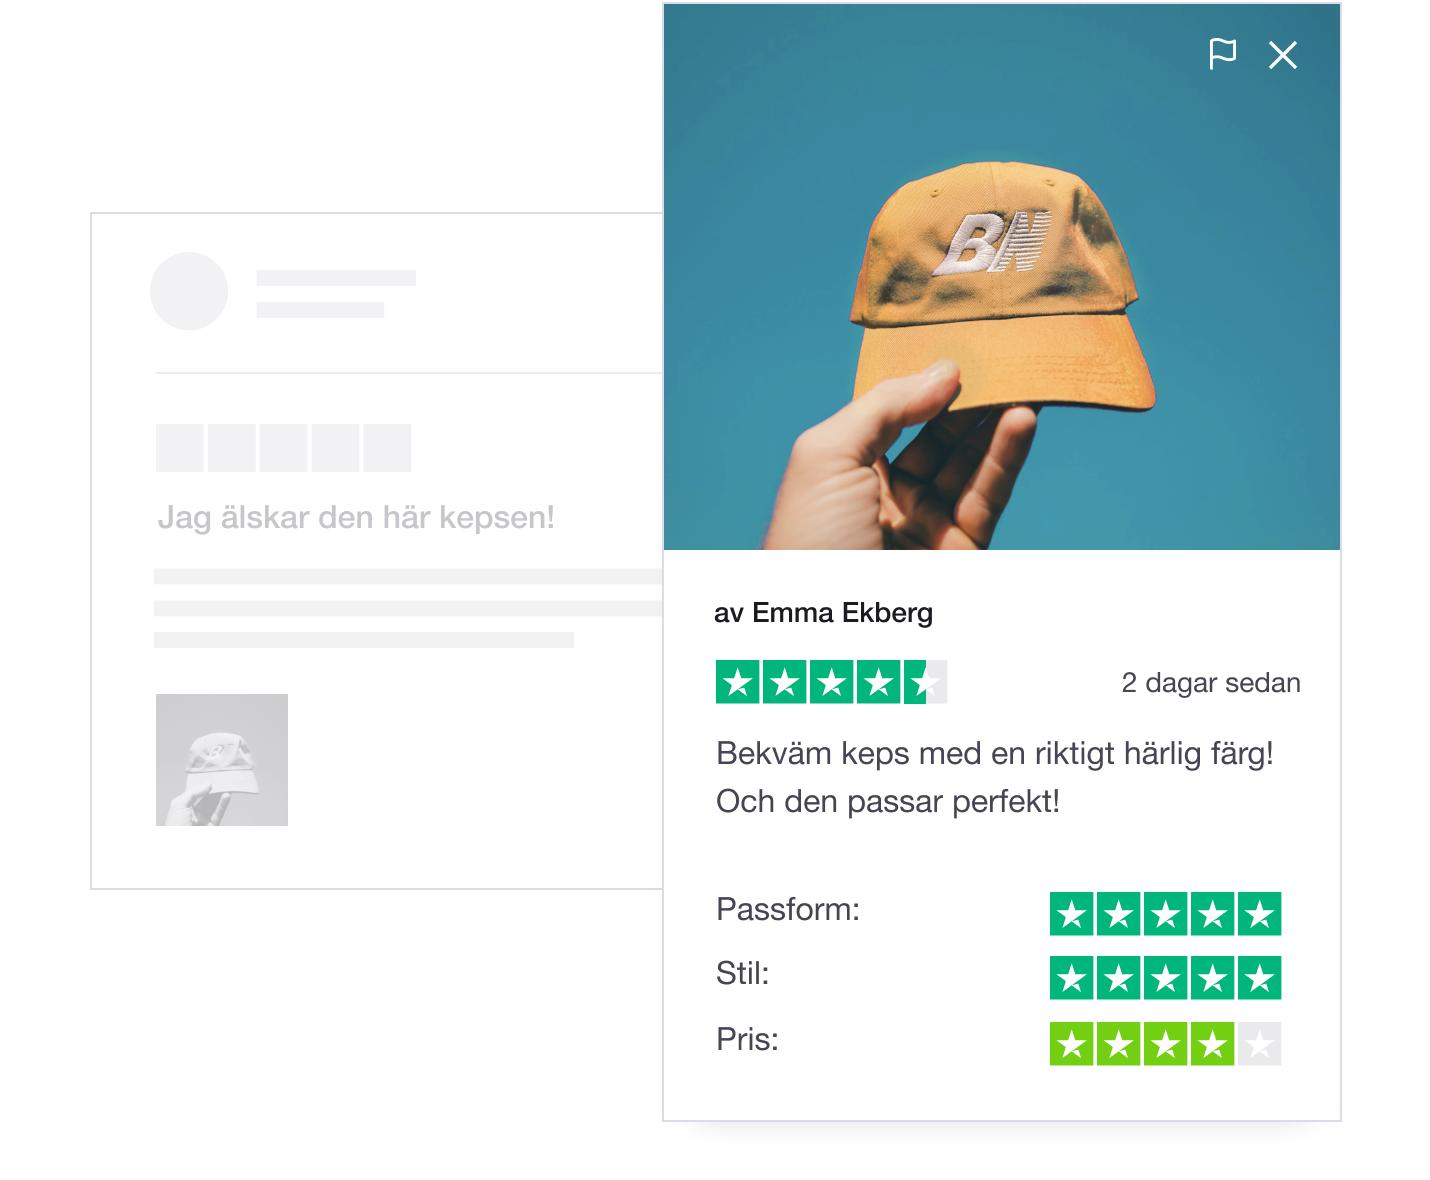 SE - Highlight customer photos